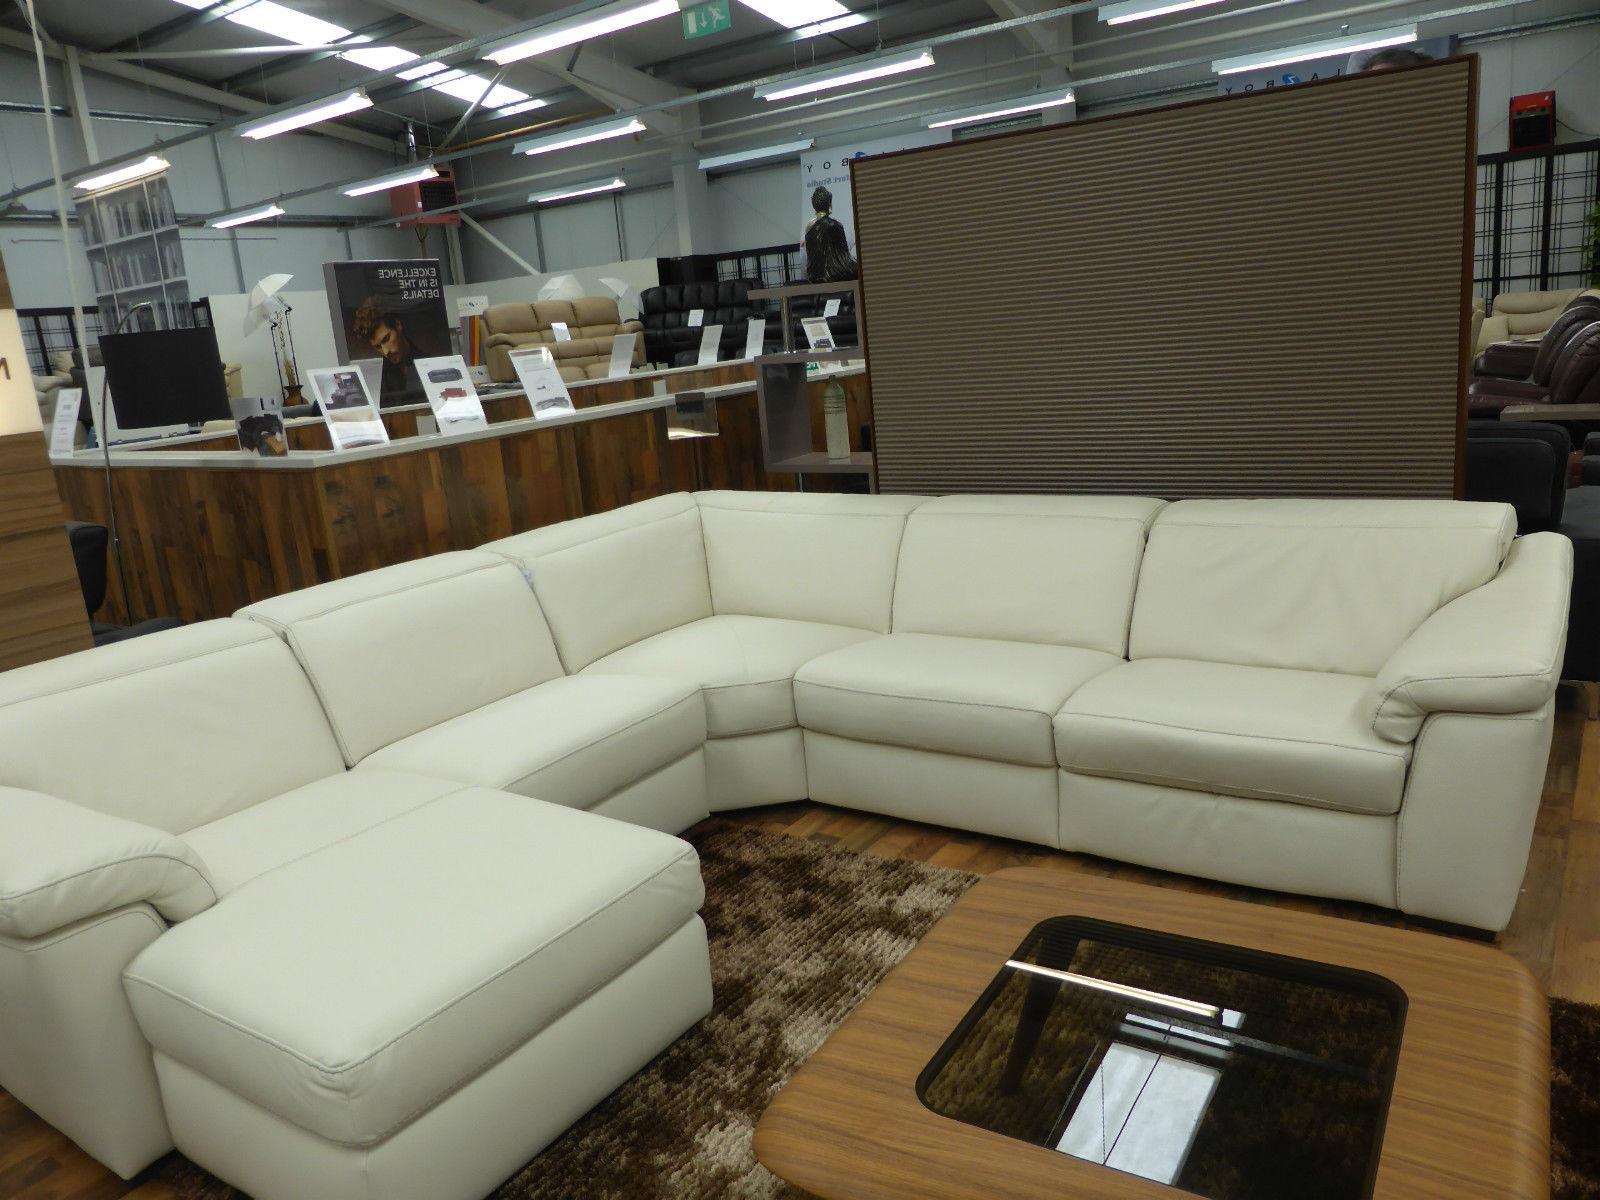 Natuzzi edition sensor b760 electric reclining lhf chaise for Sofas natuzzi outlet madrid